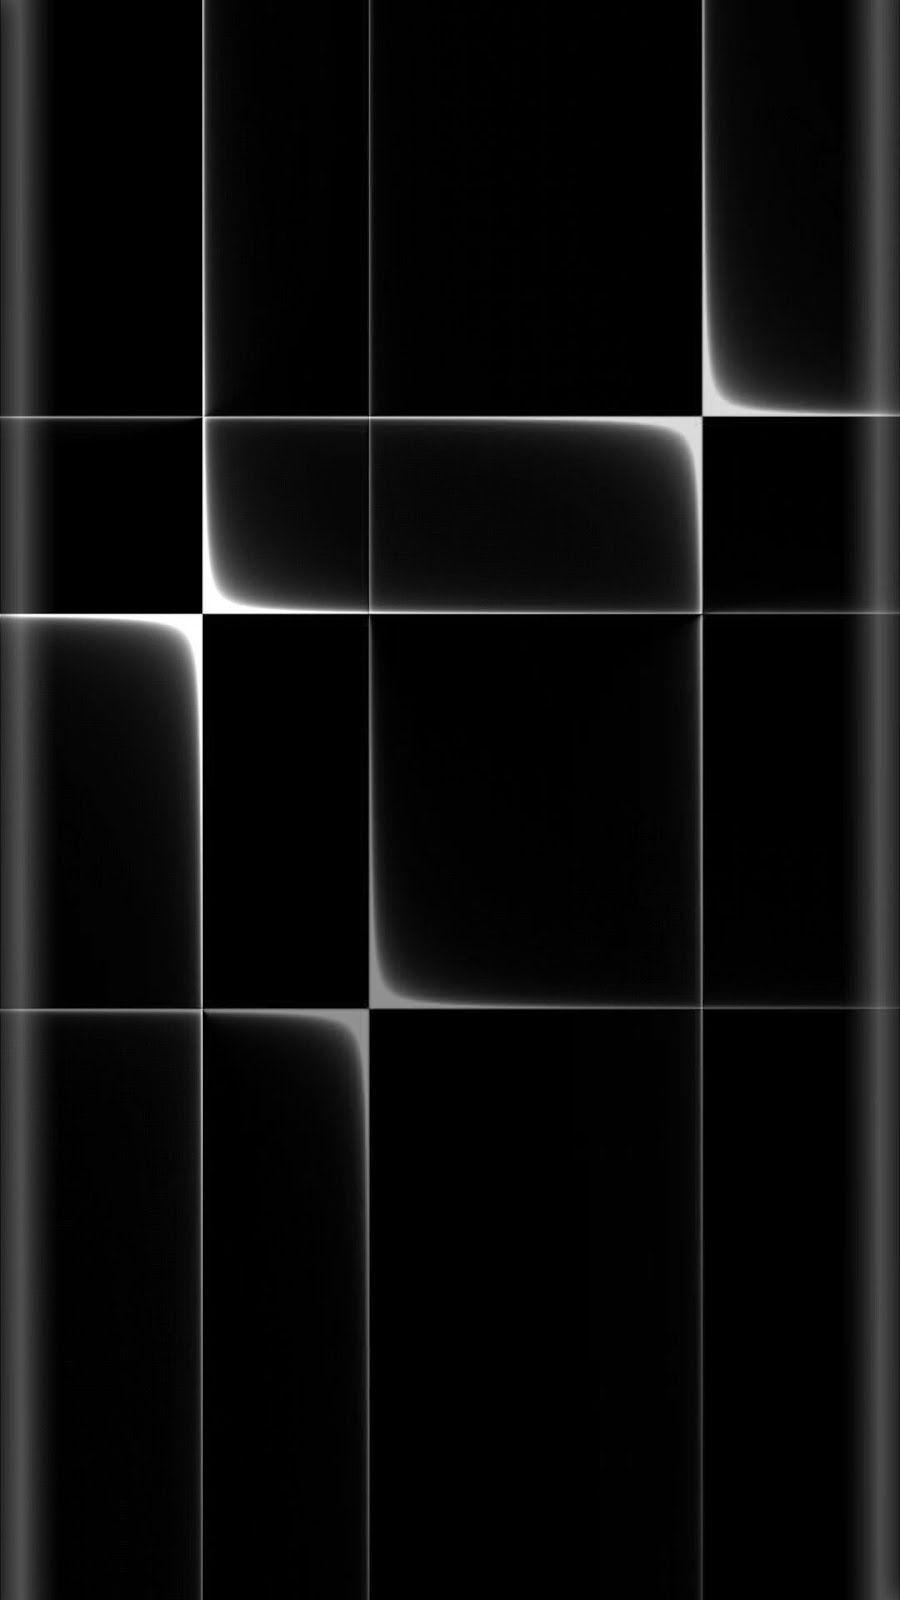 Download 52 Best 3d Dark Wallpapers For Mobile Ashueffects Black Wallpaper For Mobile Dark Wallpaper Black Hd Wallpaper